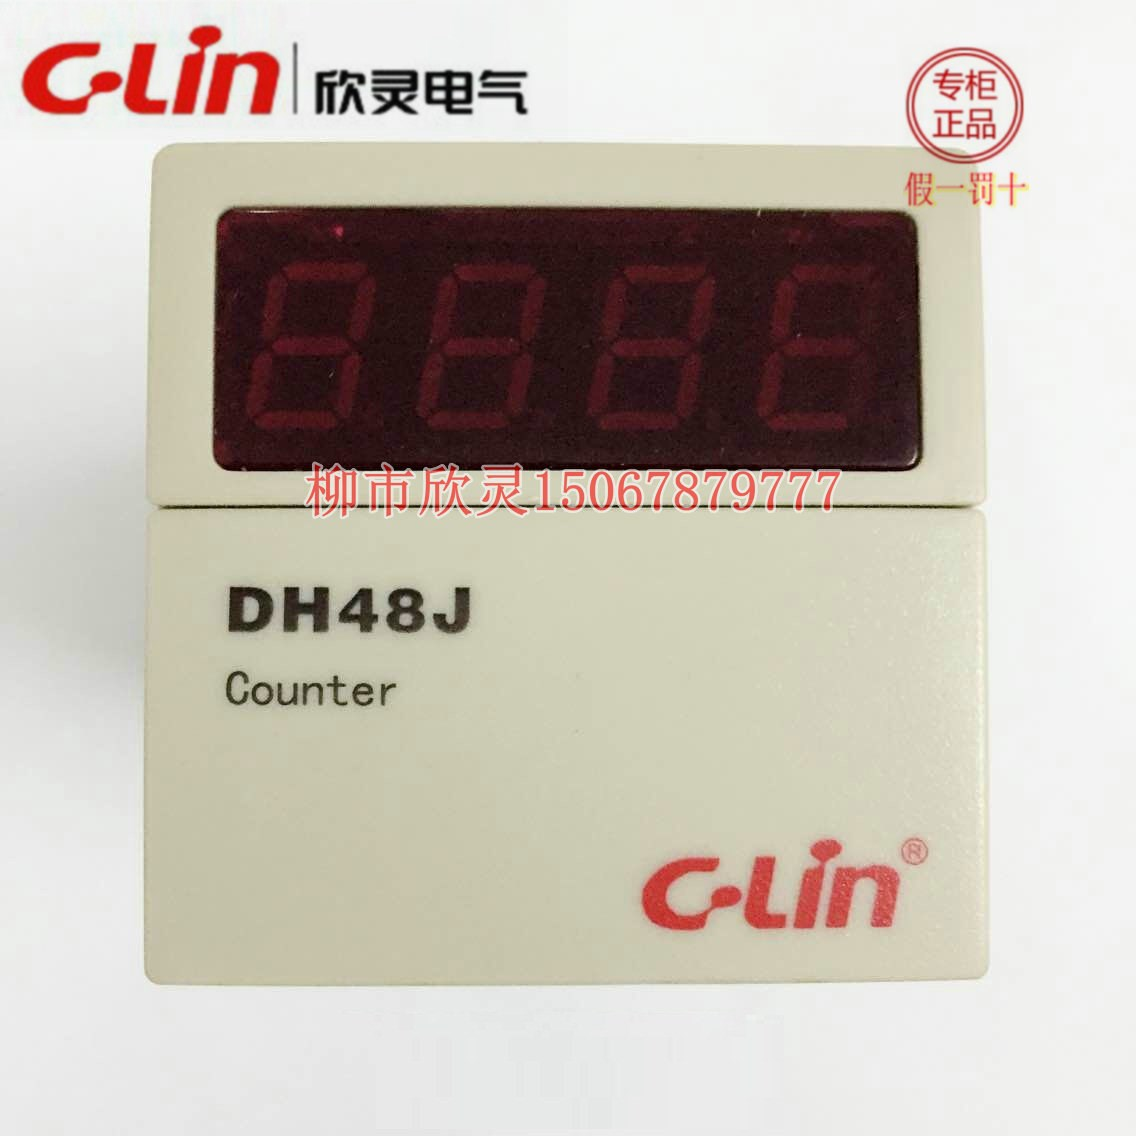 C-Lin欣灵 DH48J(HHJ1-A) 数显计数继电器 8个脚 带底座 N或C制式